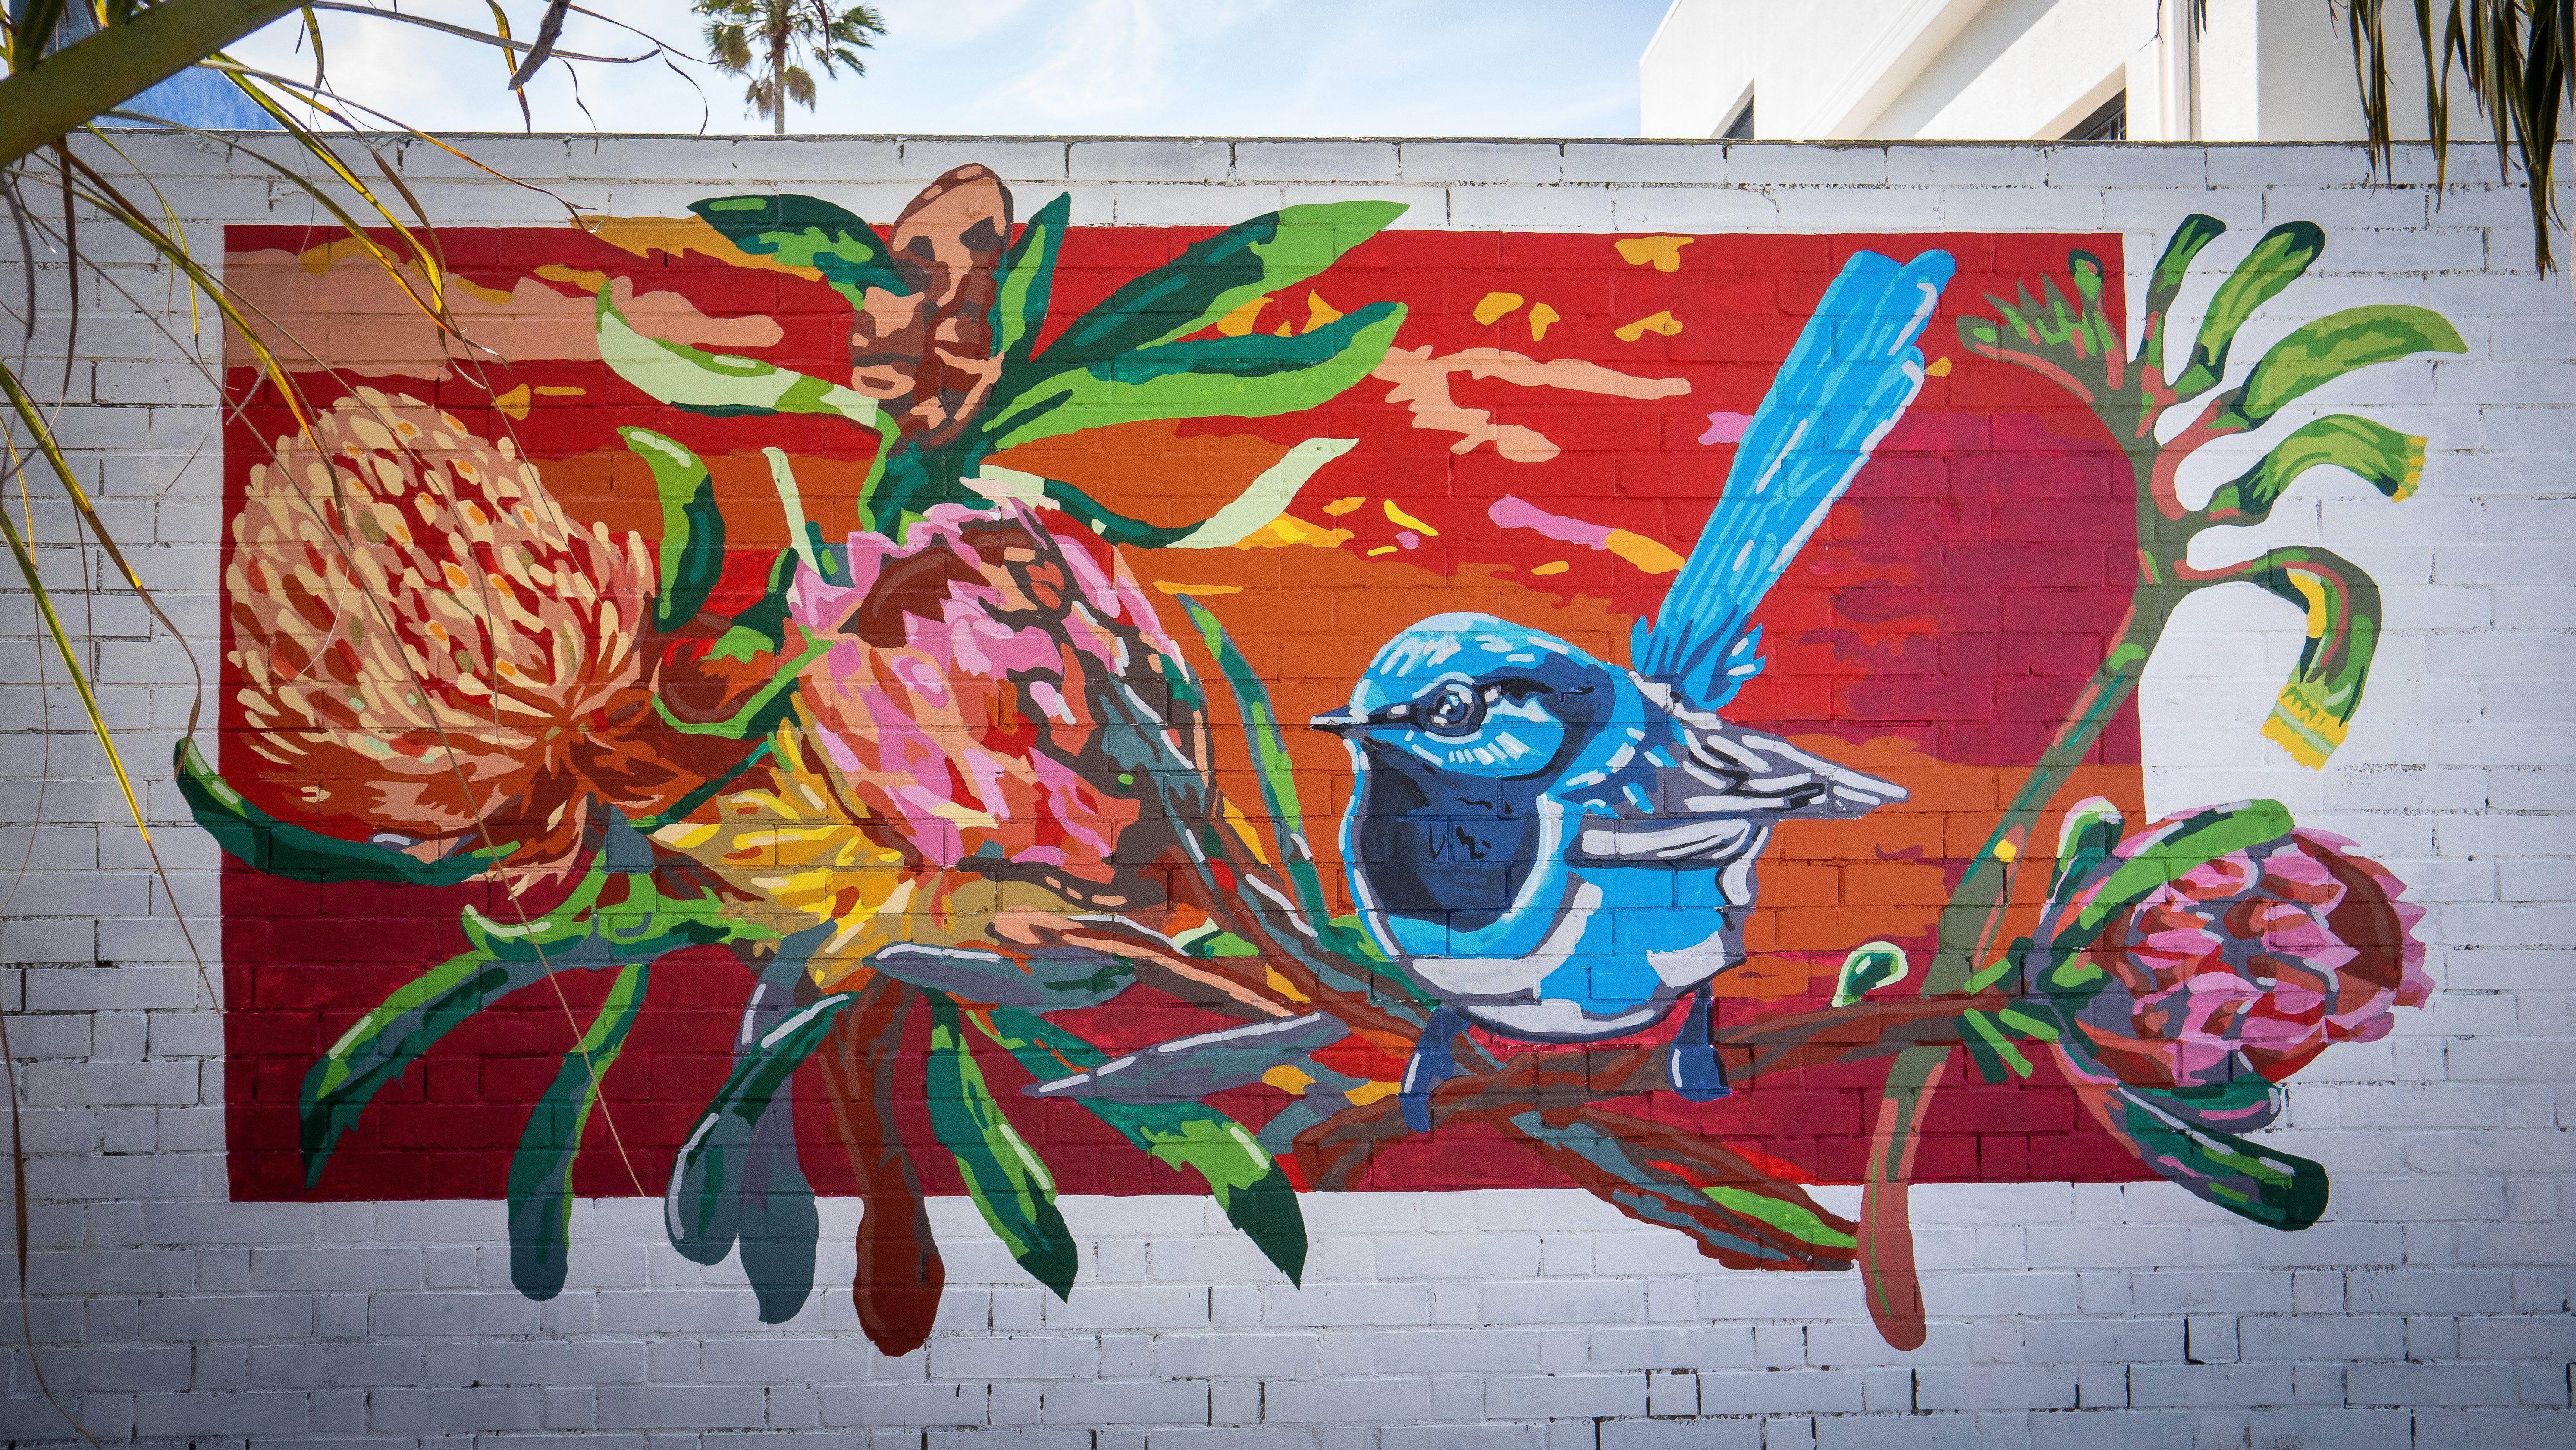 Graffiti artists in melbourne graffiti artists for hire